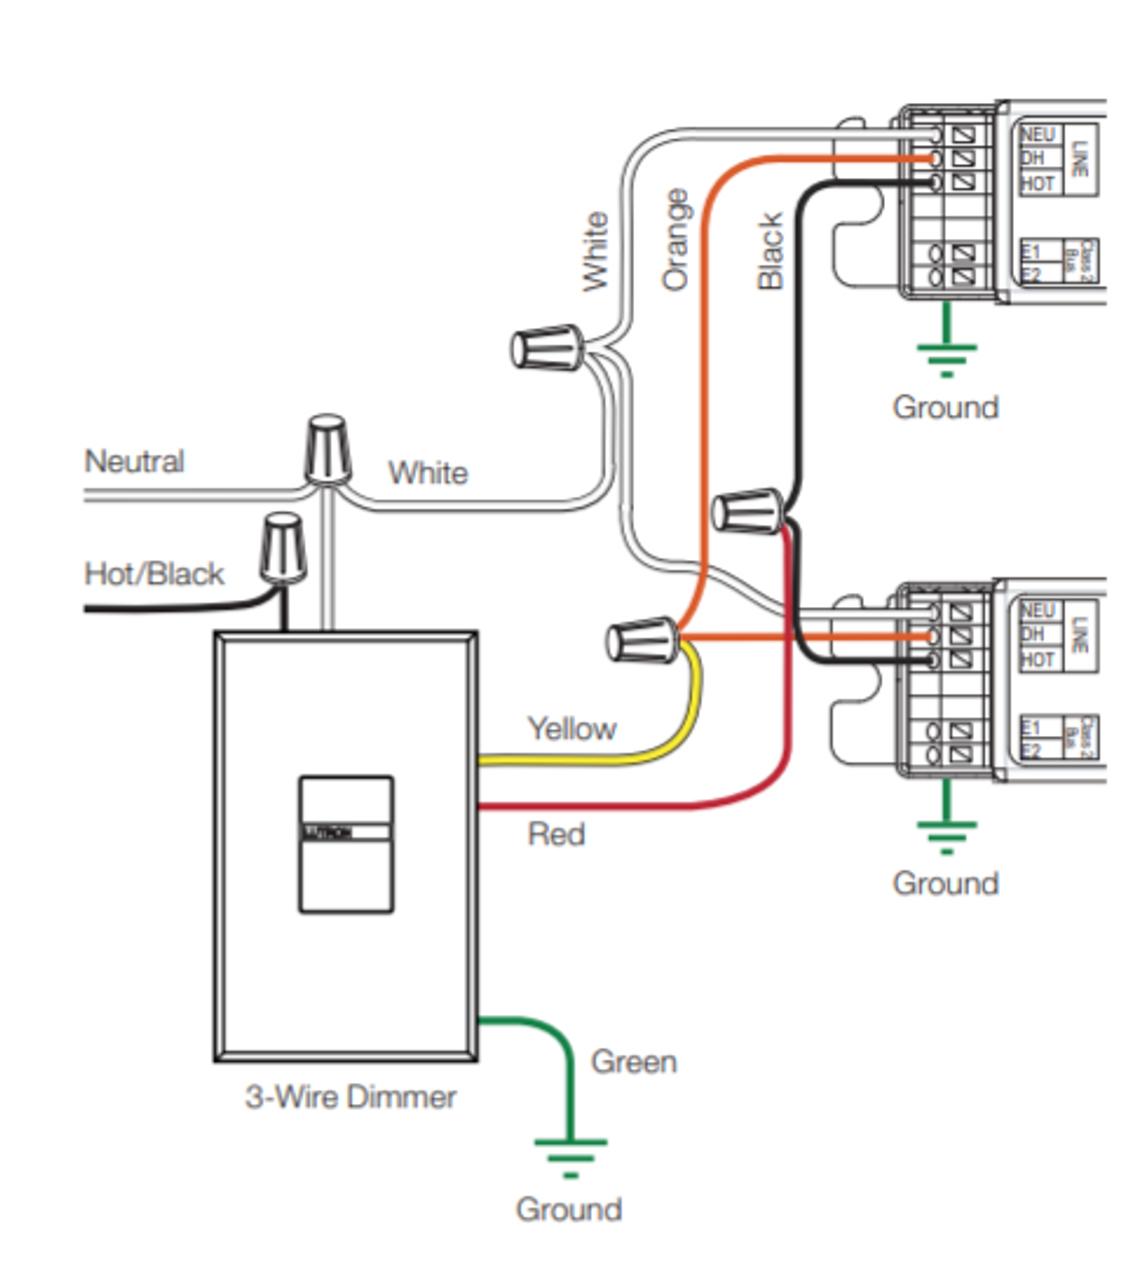 H3DT528CU110 Lutron Hi-Lume 3D Dimming Ballast | Ge Dimming Ballast Wiring Diagram |  | BallastShop.com